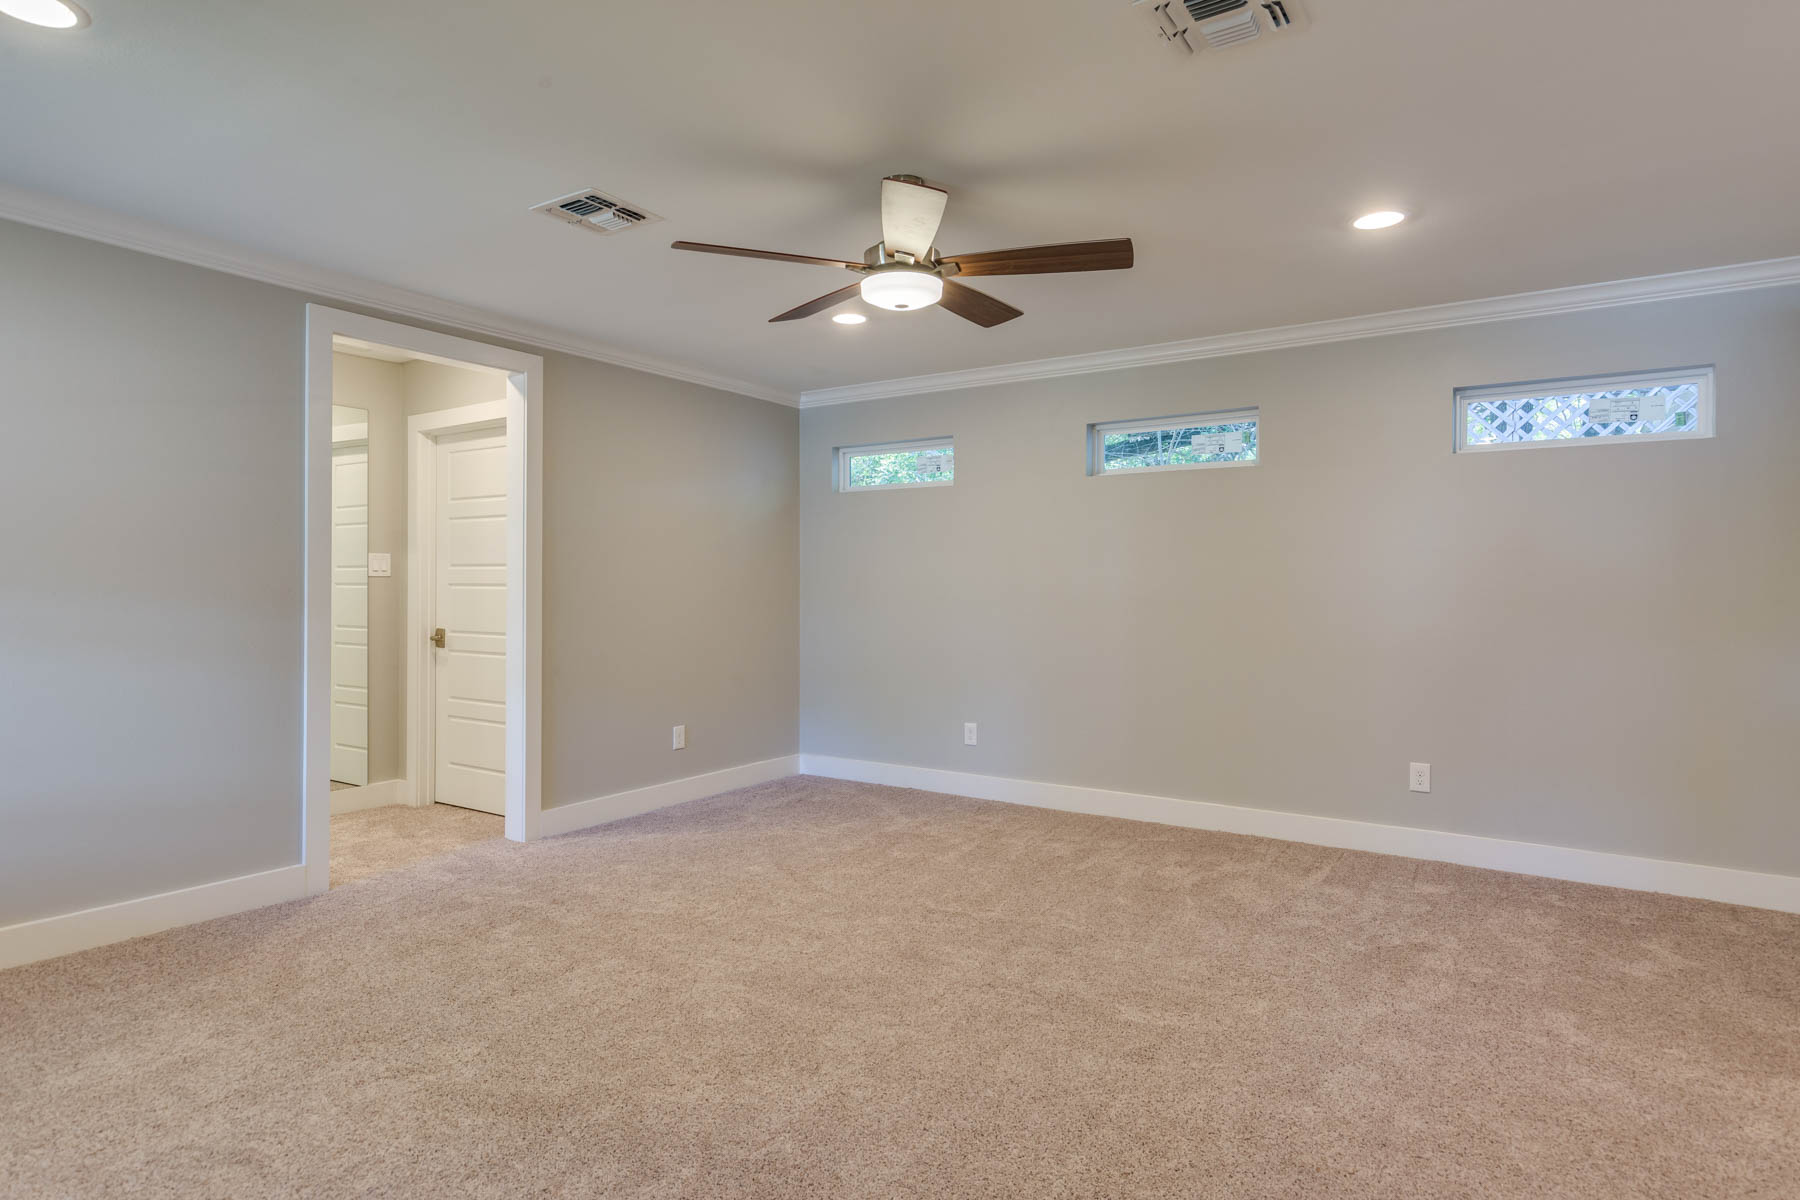 Additional photo for property listing at Stunning Home in AHISD 1922 Flamingo Dr San Antonio, Texas 78209 Estados Unidos